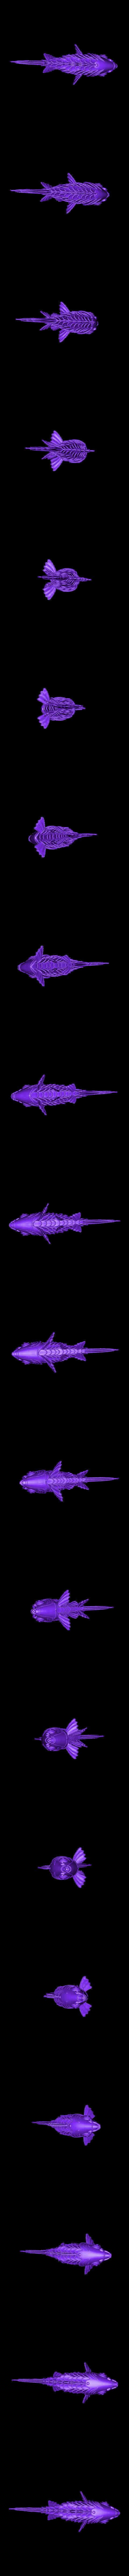 Koi_Fish.stl Download free STL file 'On Such a Full Sea' Koi Fish • 3D printable design, RaymondDeLuca